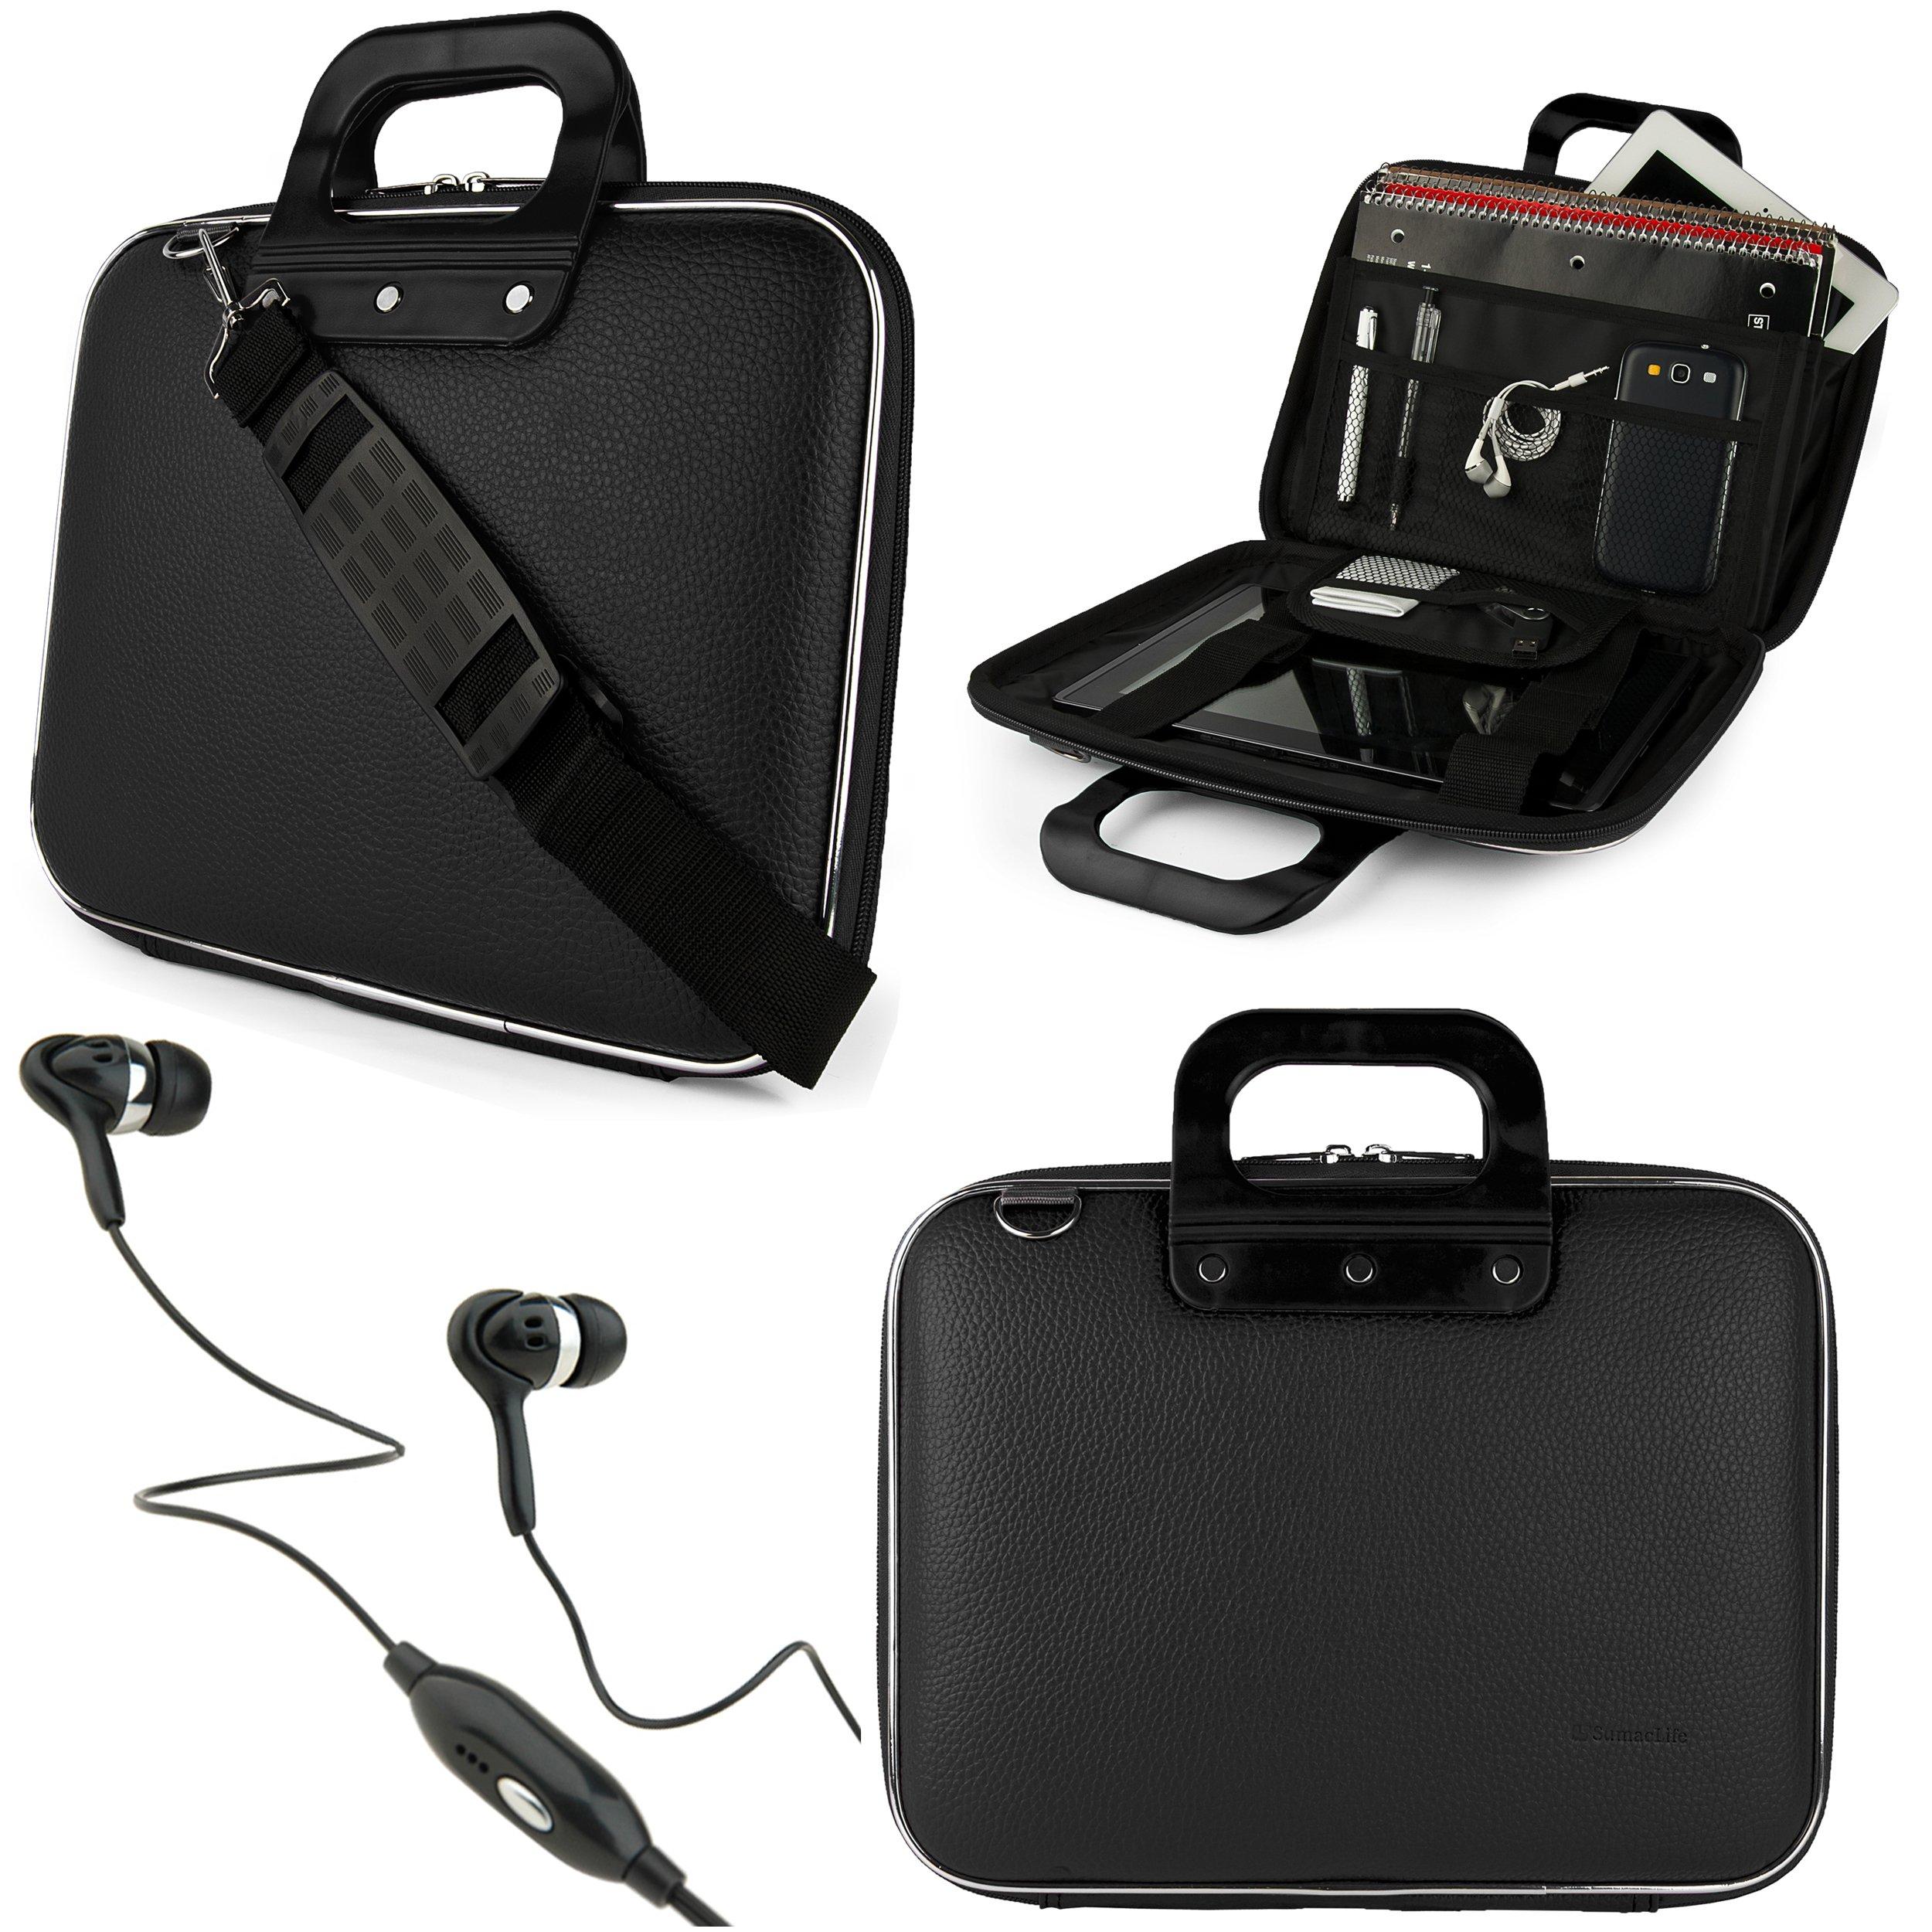 SumacLife Cady 10.1-inch Tablet Messenger Bag for Lenovo Ideapad MIIX 300 with Black Headphones (Black)